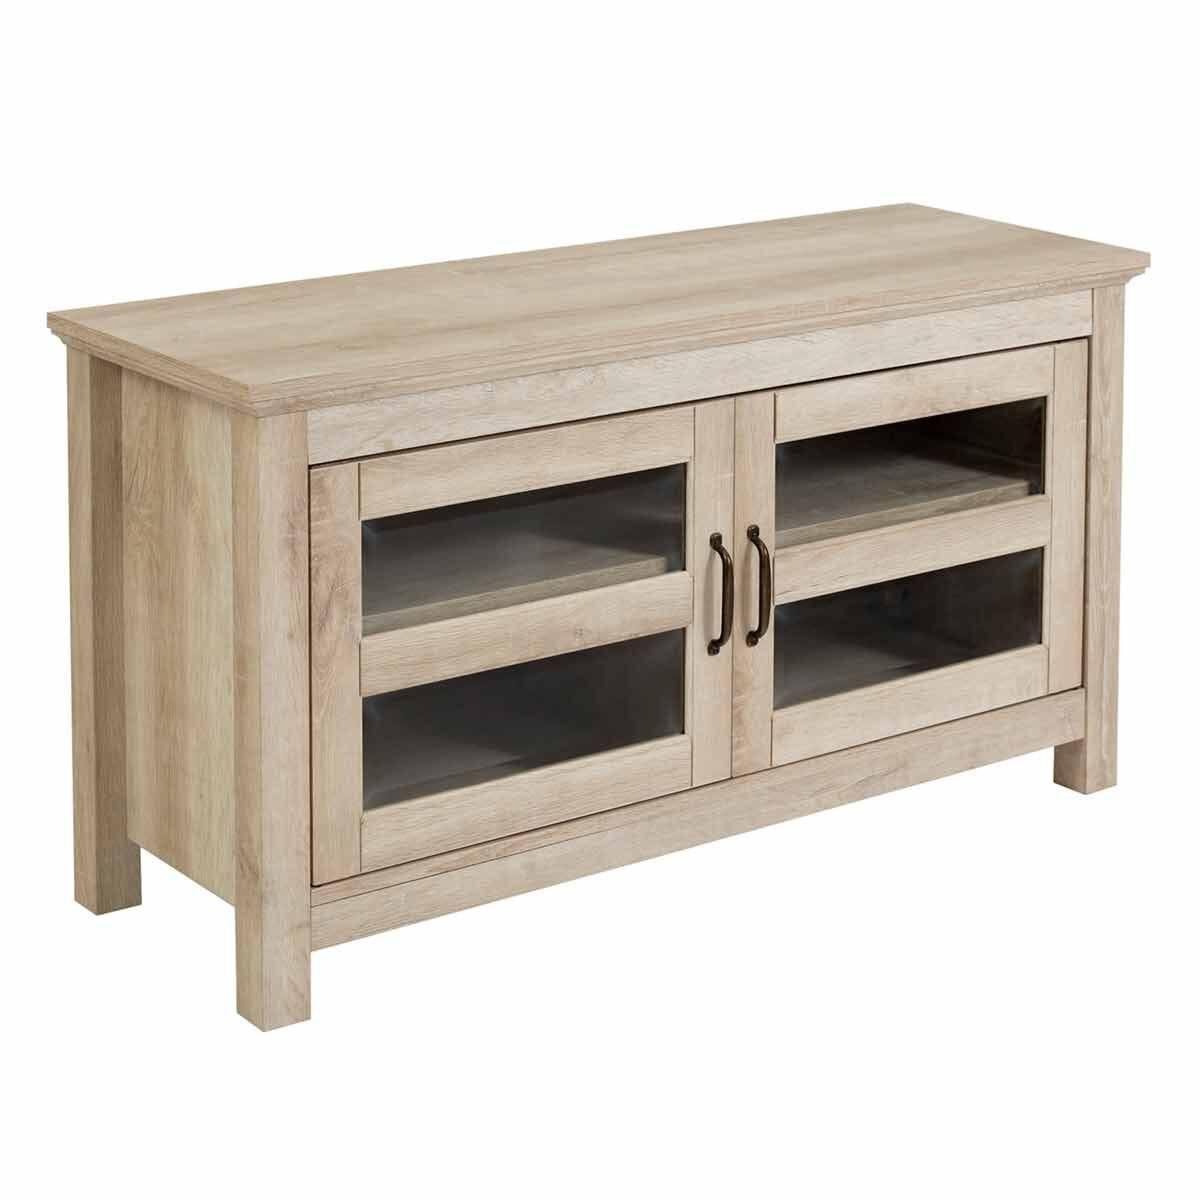 Carpi Wooden TV Stand Light Oak